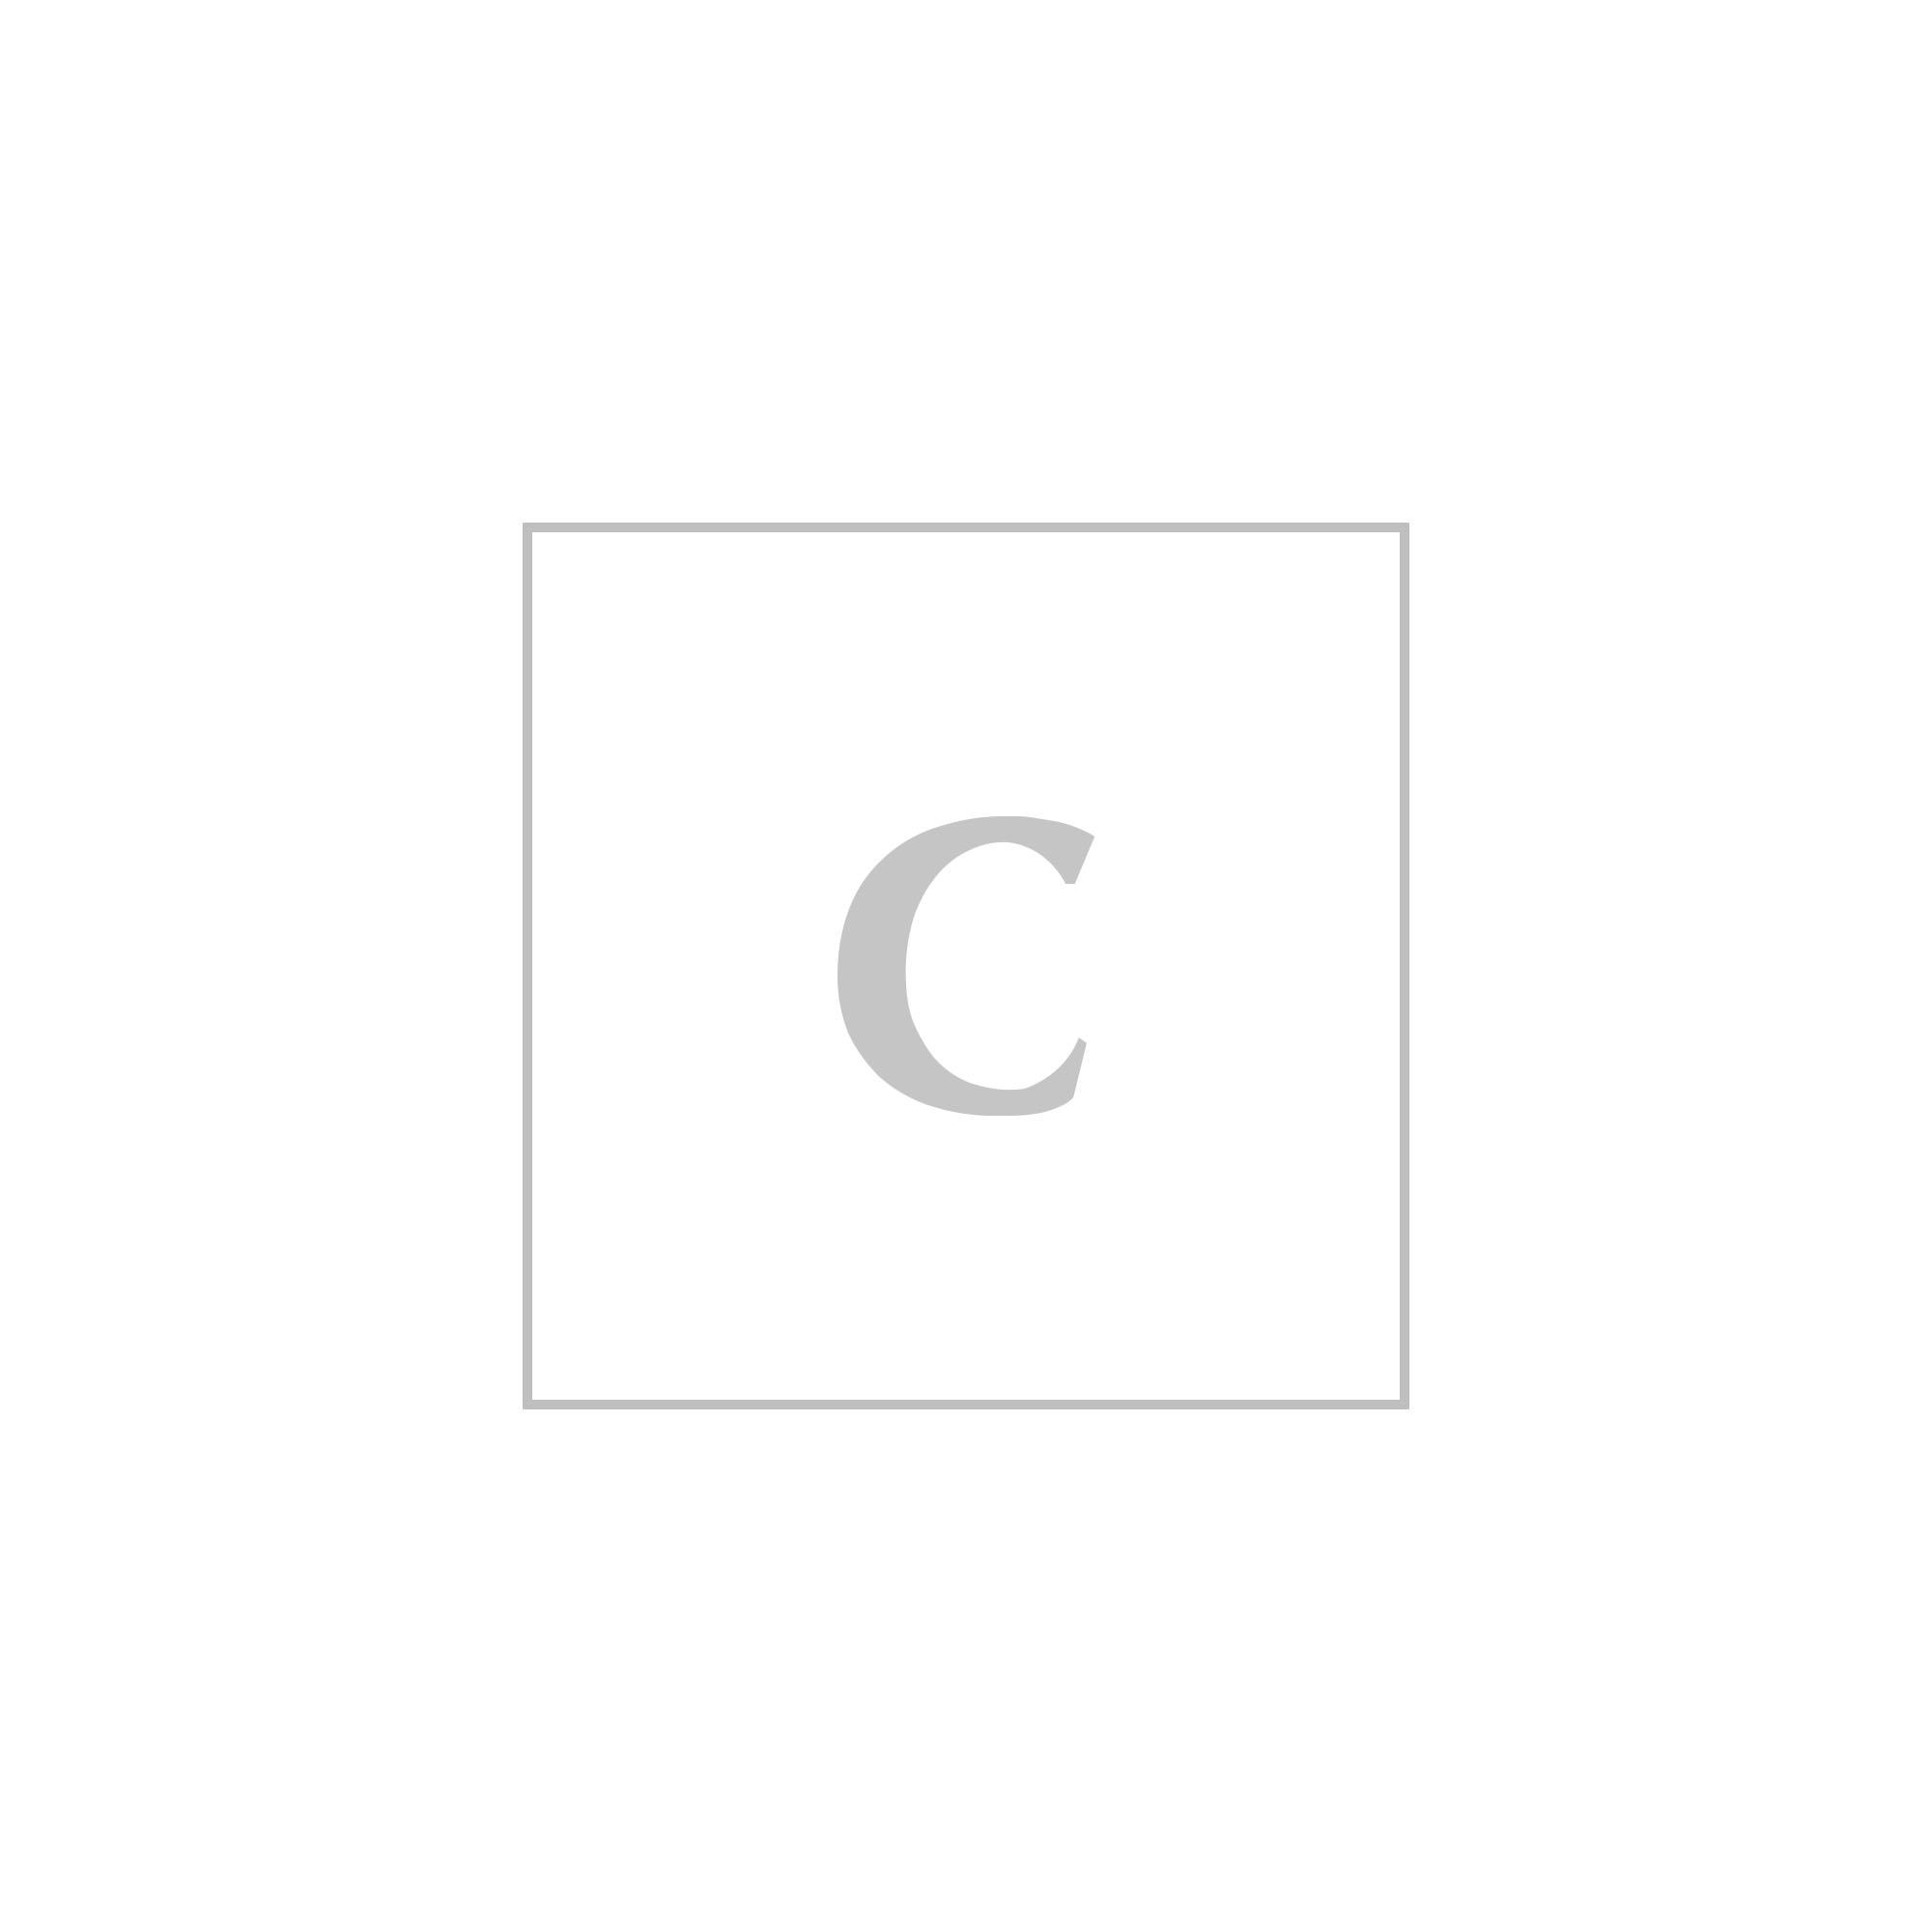 Fendi scialle 140x140 cm jacquard lurex new zucca